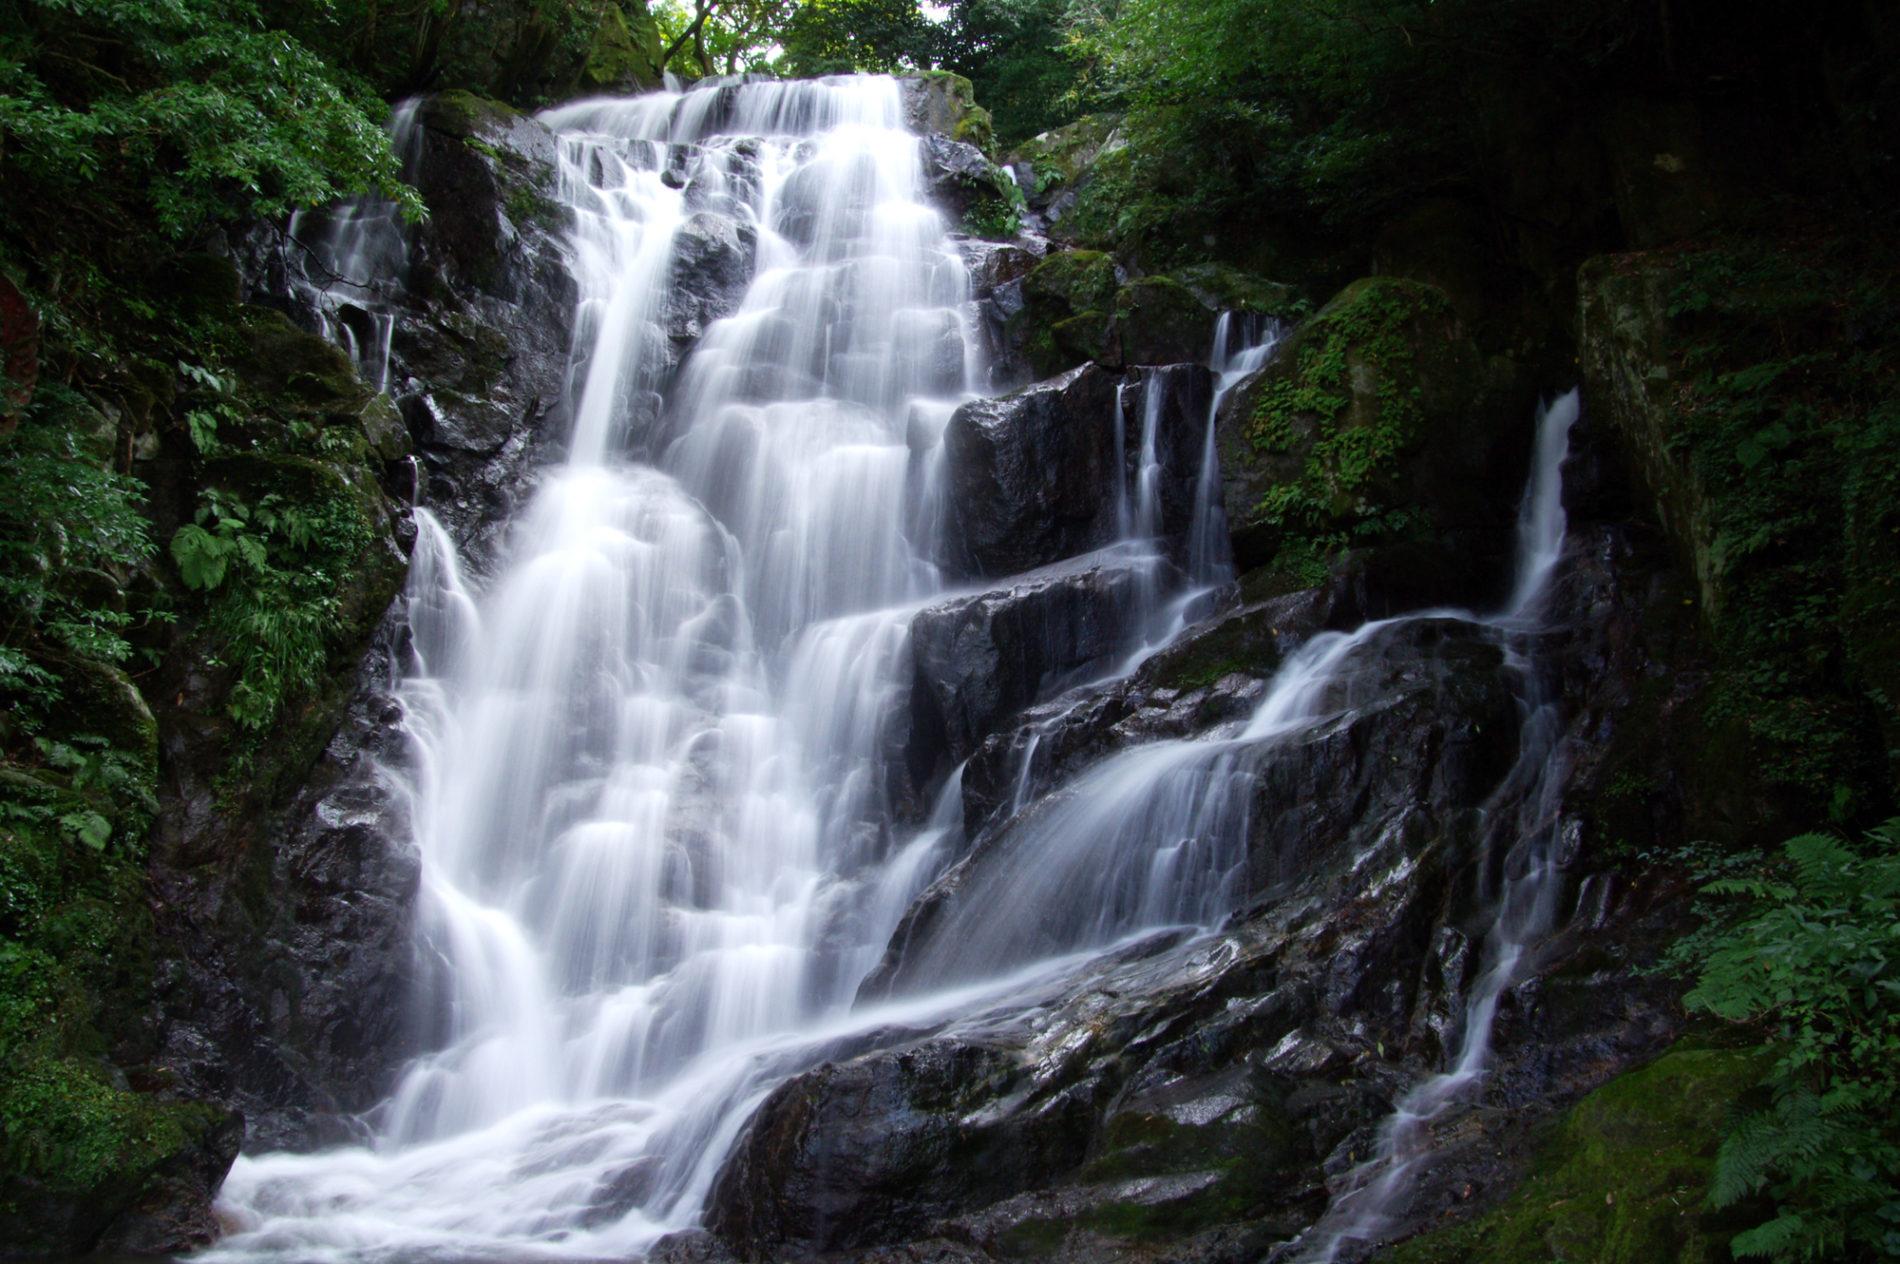 福岡県糸島市白糸の滝